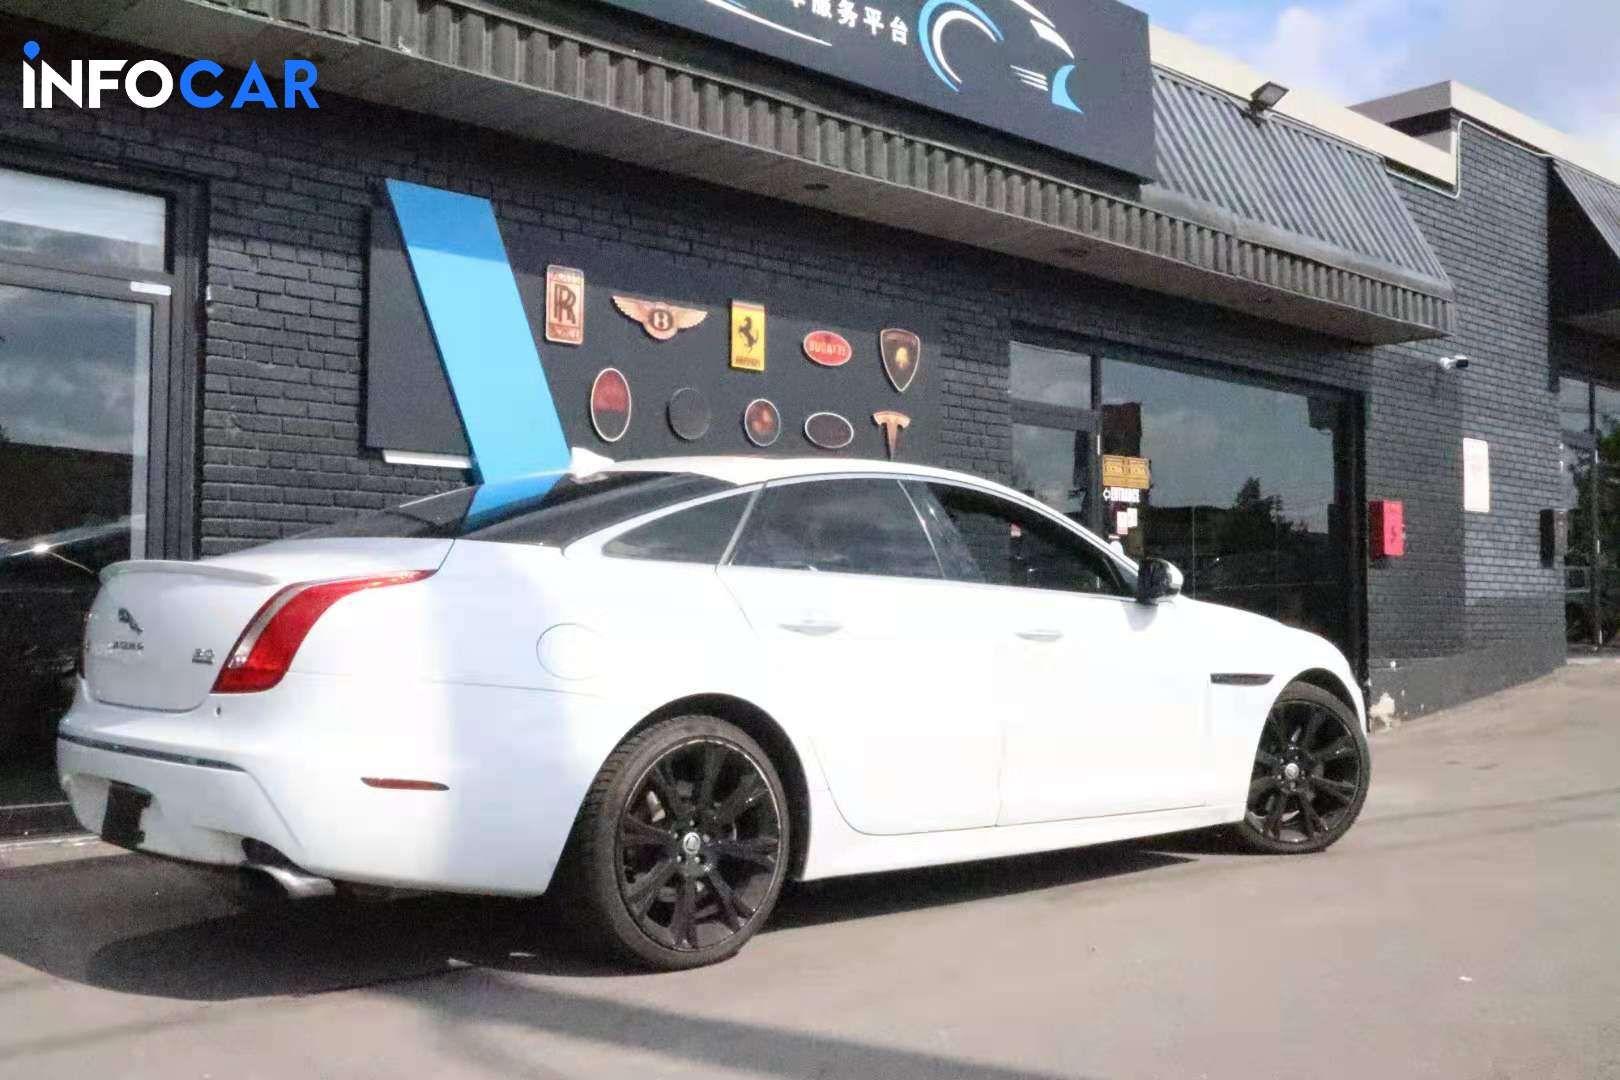 2015 Jaguar XJ premium - INFOCAR - Toronto's Most Comprehensive New and Used Auto Trading Platform